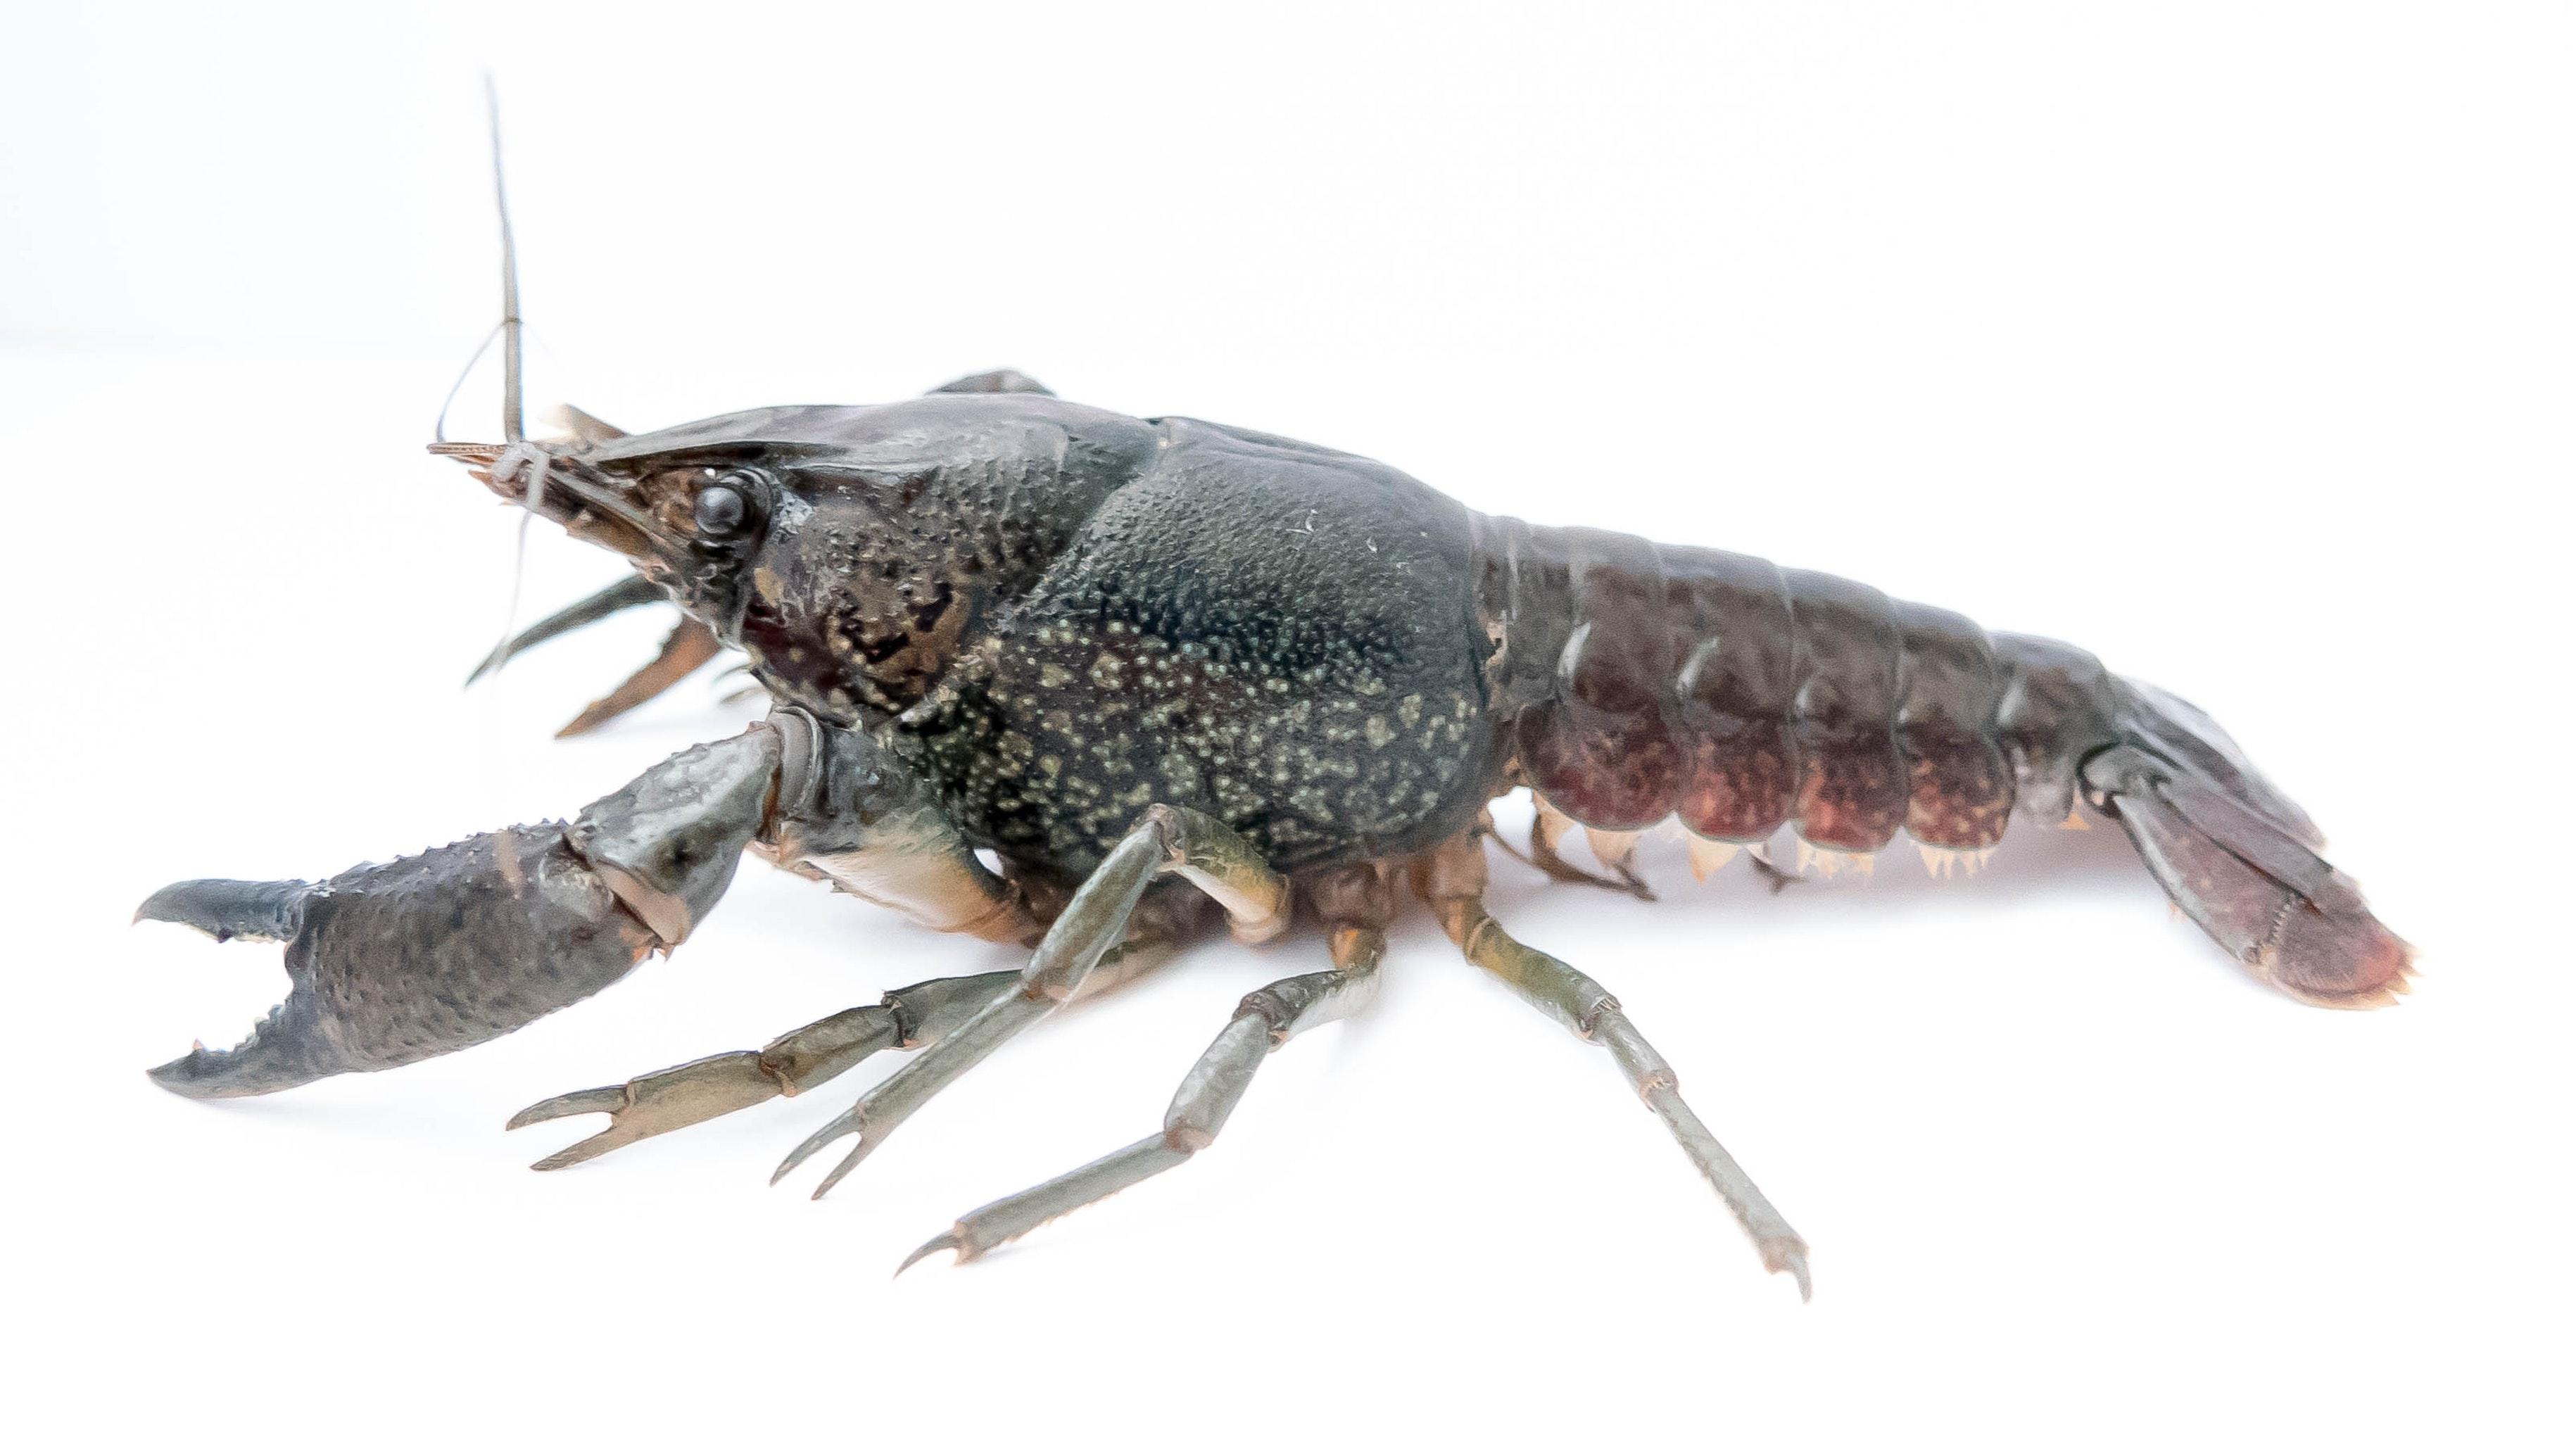 MrCrayfish / Mods